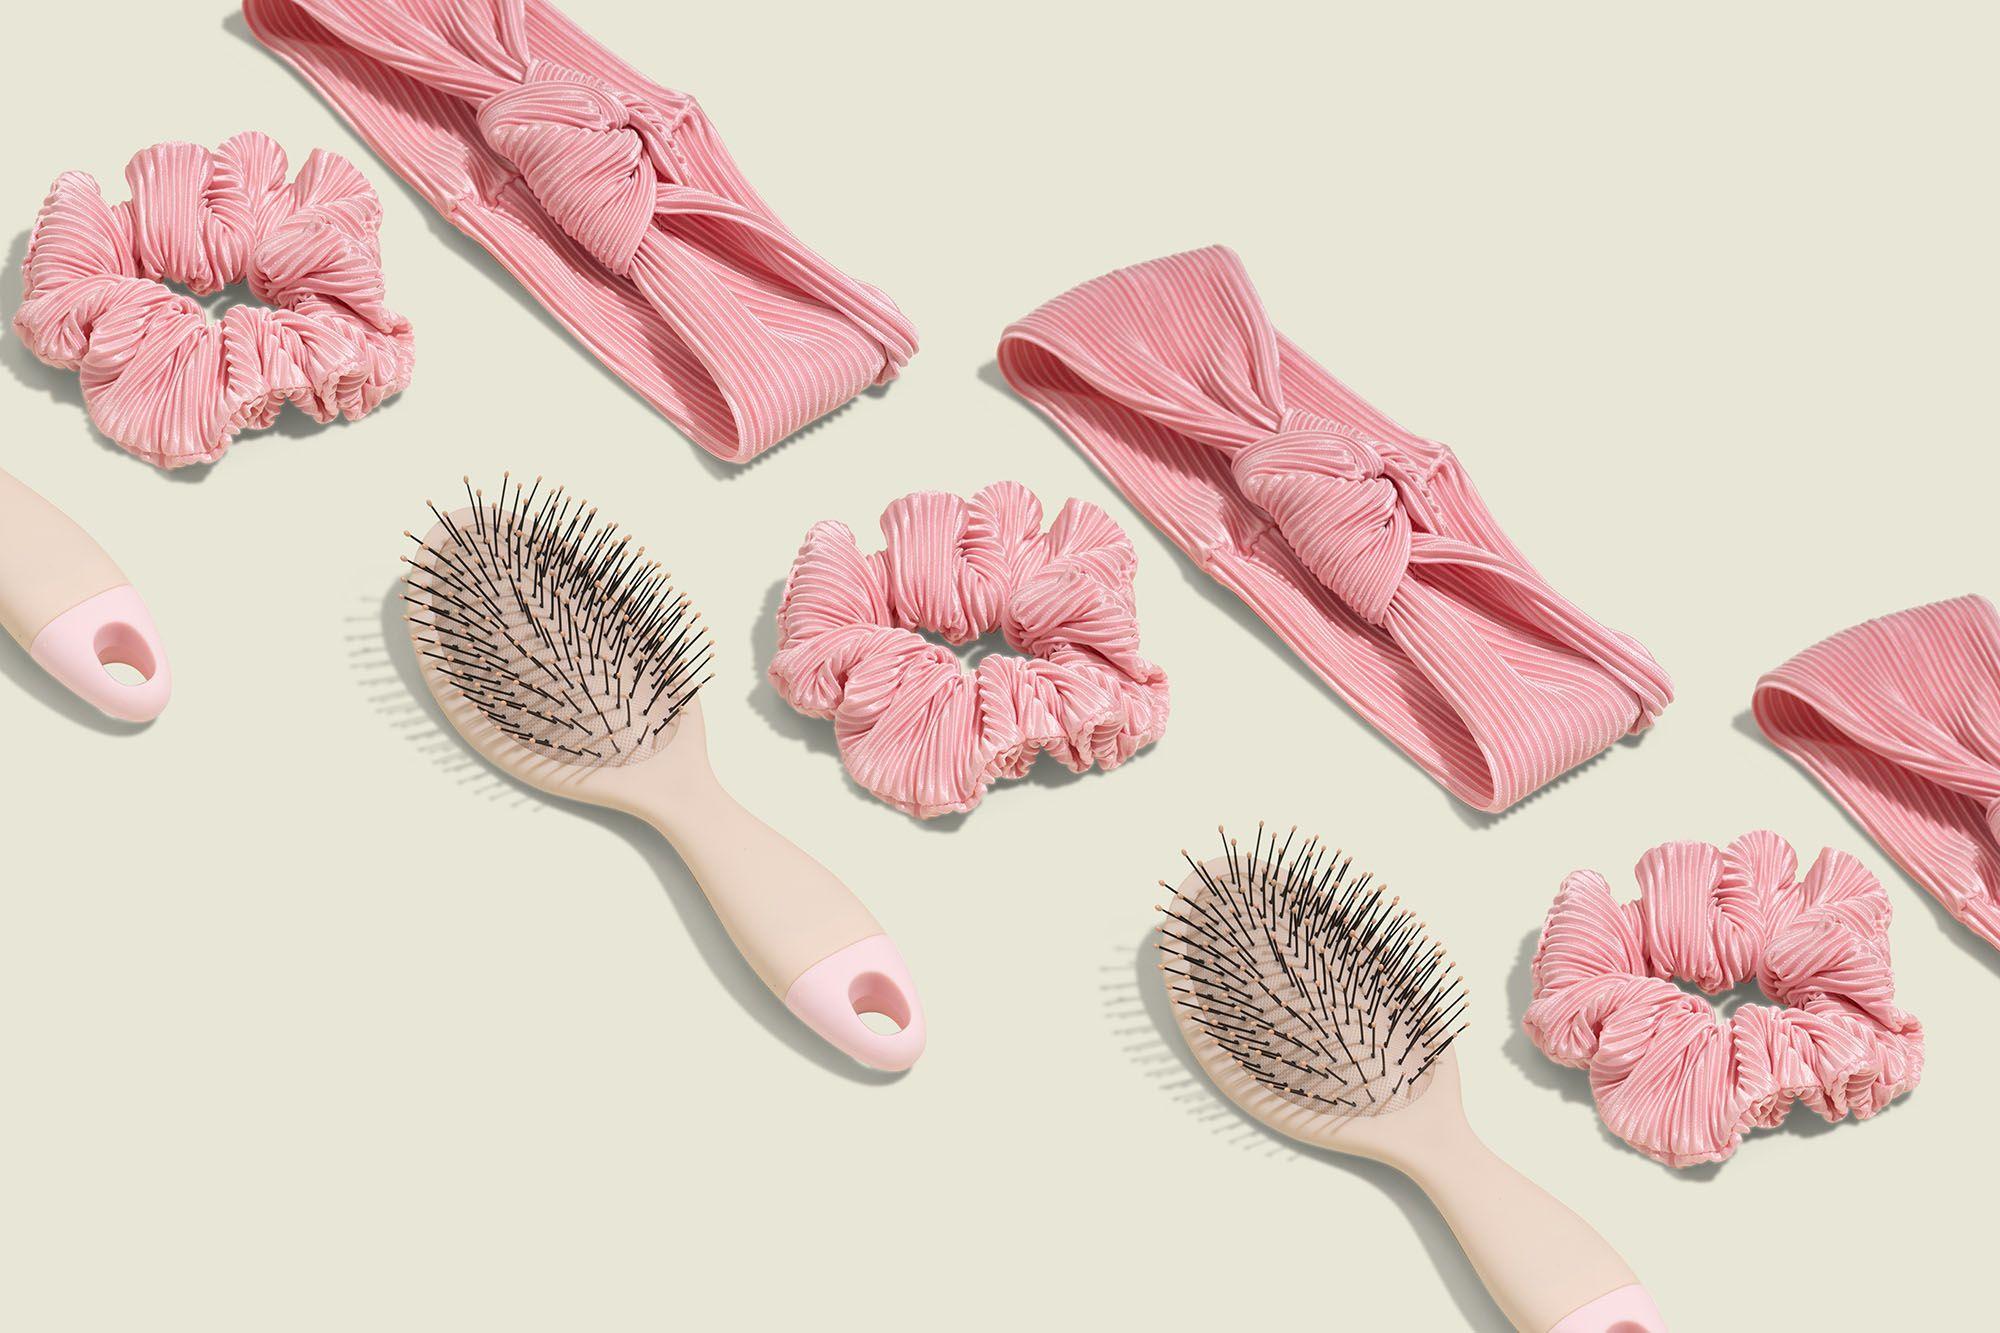 Hair brush with scrunchie and headband